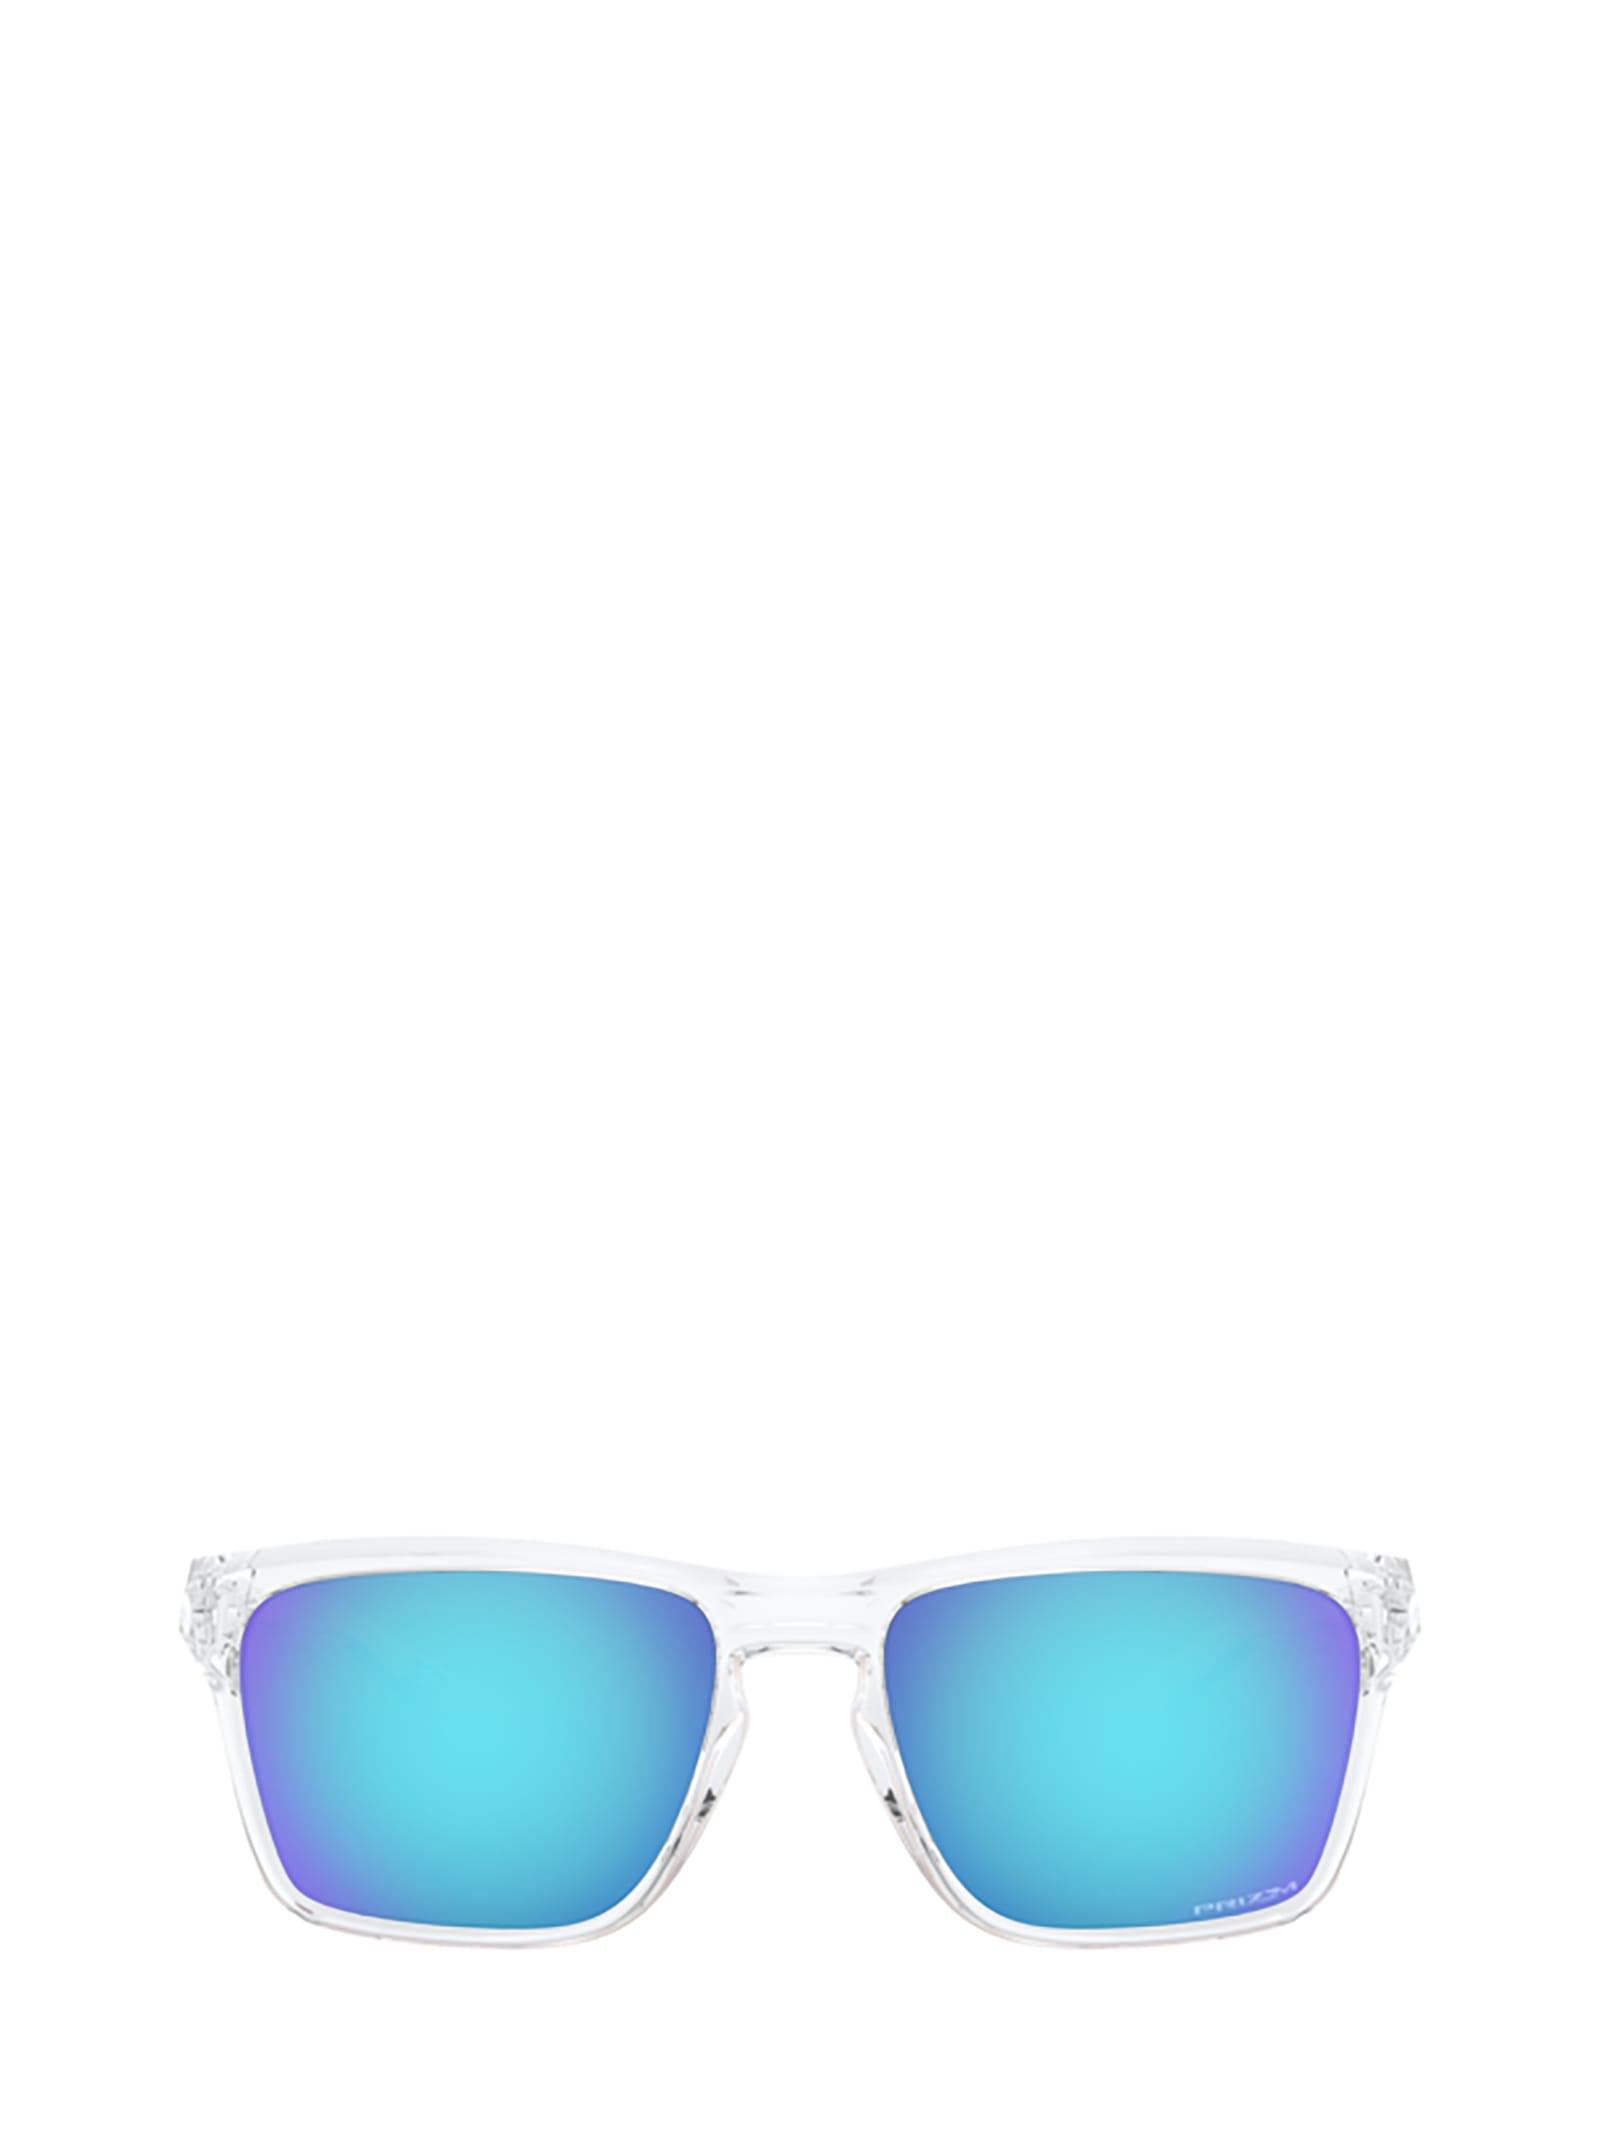 Oakley Oo9448 Polished Clear Sunglasses